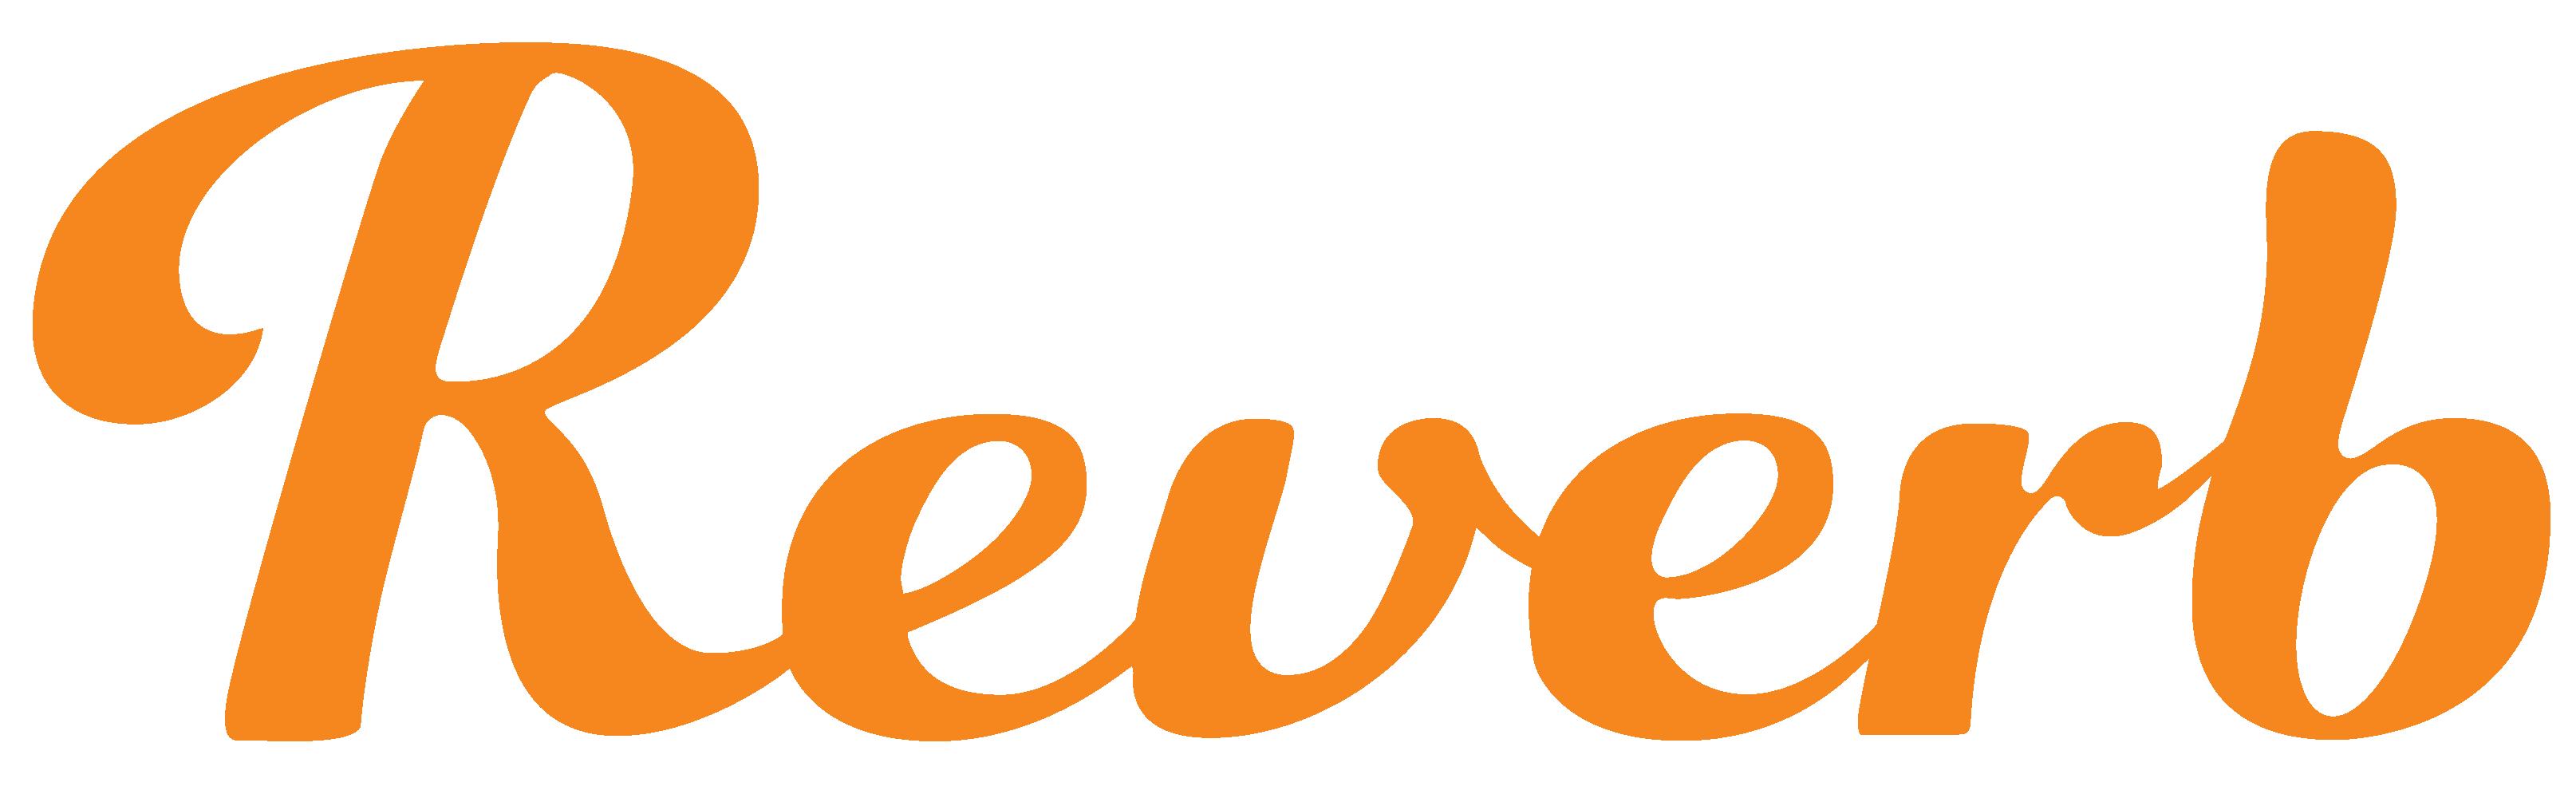 Visit Reverb.com